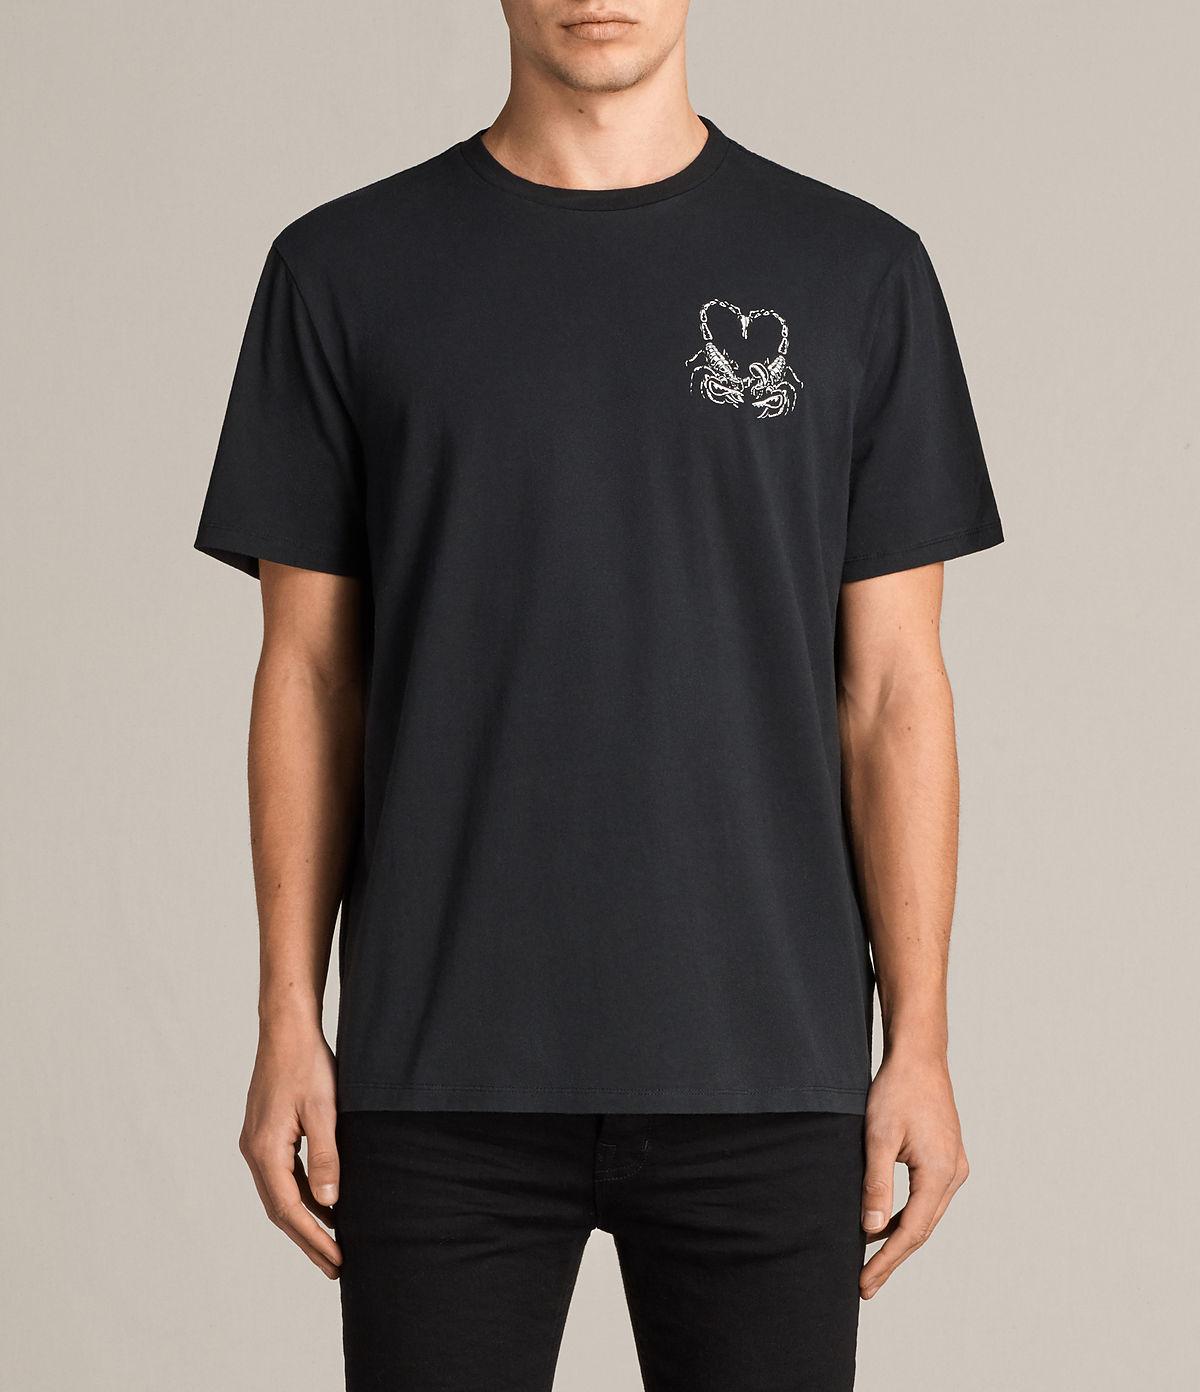 scorpy-switch-crew-t-shirt